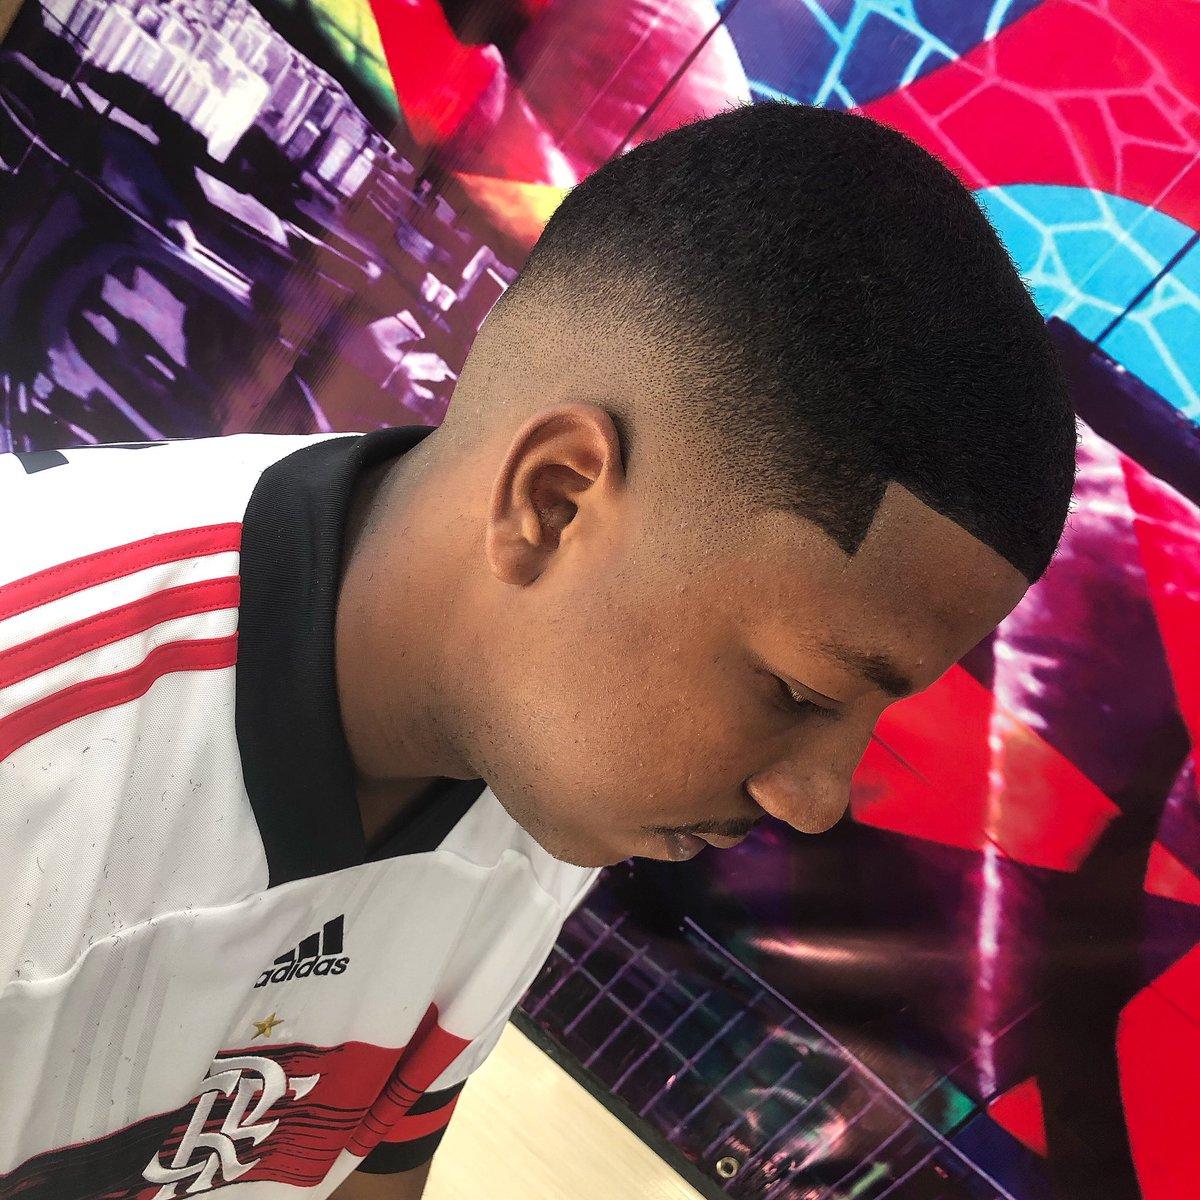 @vbandeira86 #barbersince98 #barberlife  #barberlifestyle #lowfade #haircolor #barbernations #thebarberpost #barbershop #faded #Fade #barberlife #barberlessons_ #brasilbarbers #riodejaneiro #barbero #hairstyle #brazilianhair #barbering #barcelona #barbergrind #barbers #fadepic.twitter.com/LOSFRDTqEP